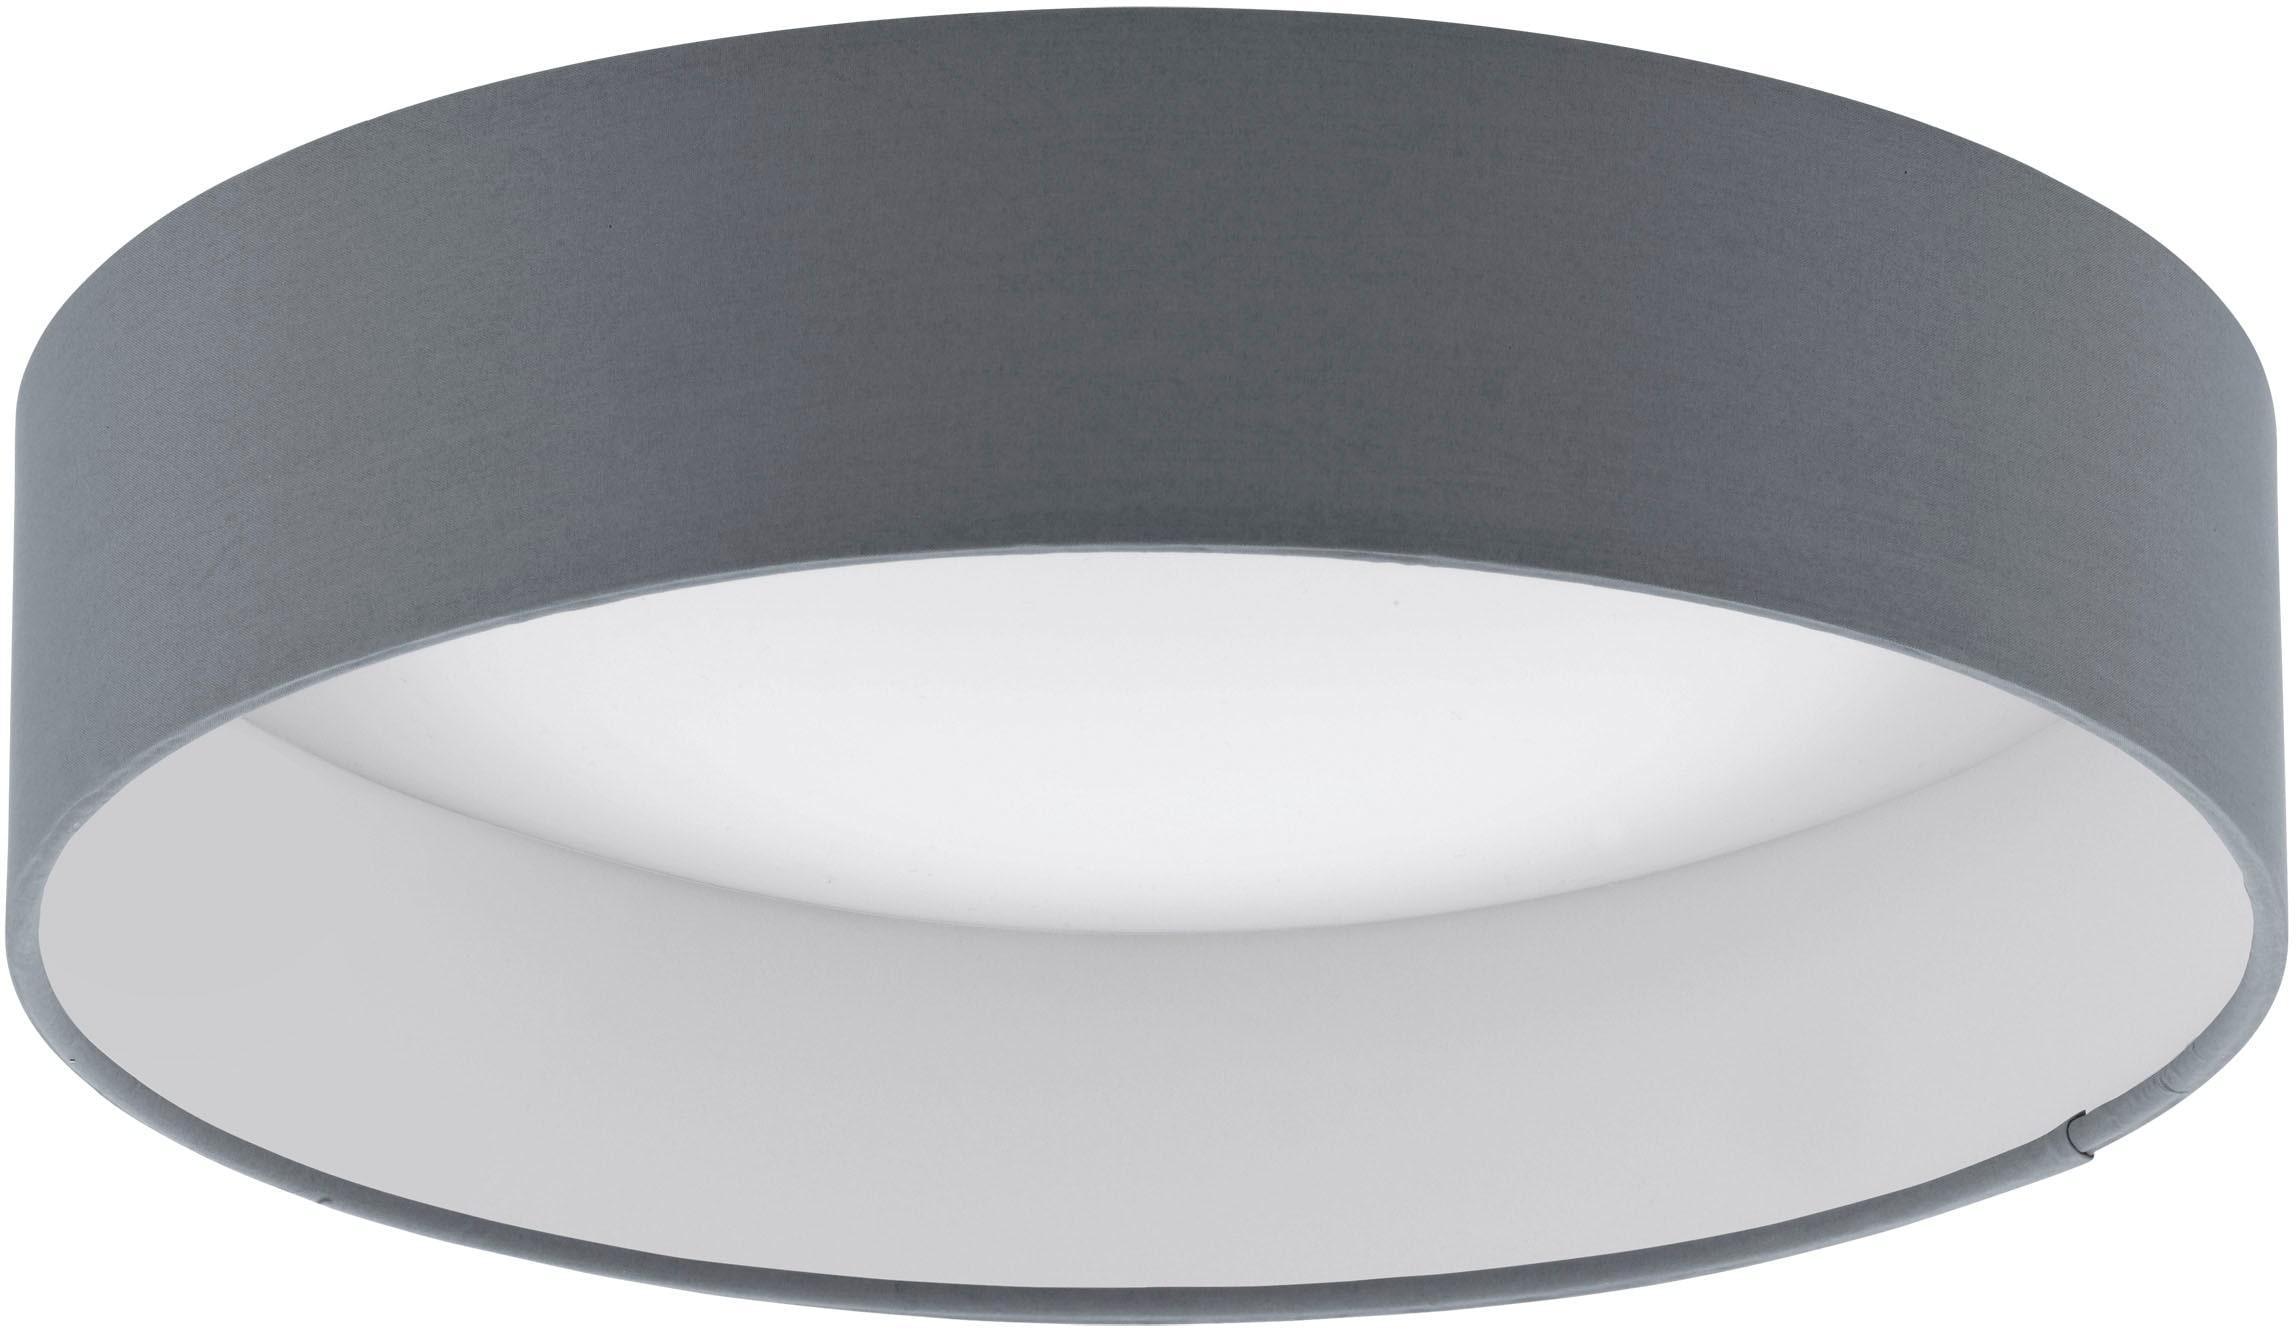 EGLO LED Deckenleuchte PALOMARO, LED-Board, Warmweiß, LED tauschbar